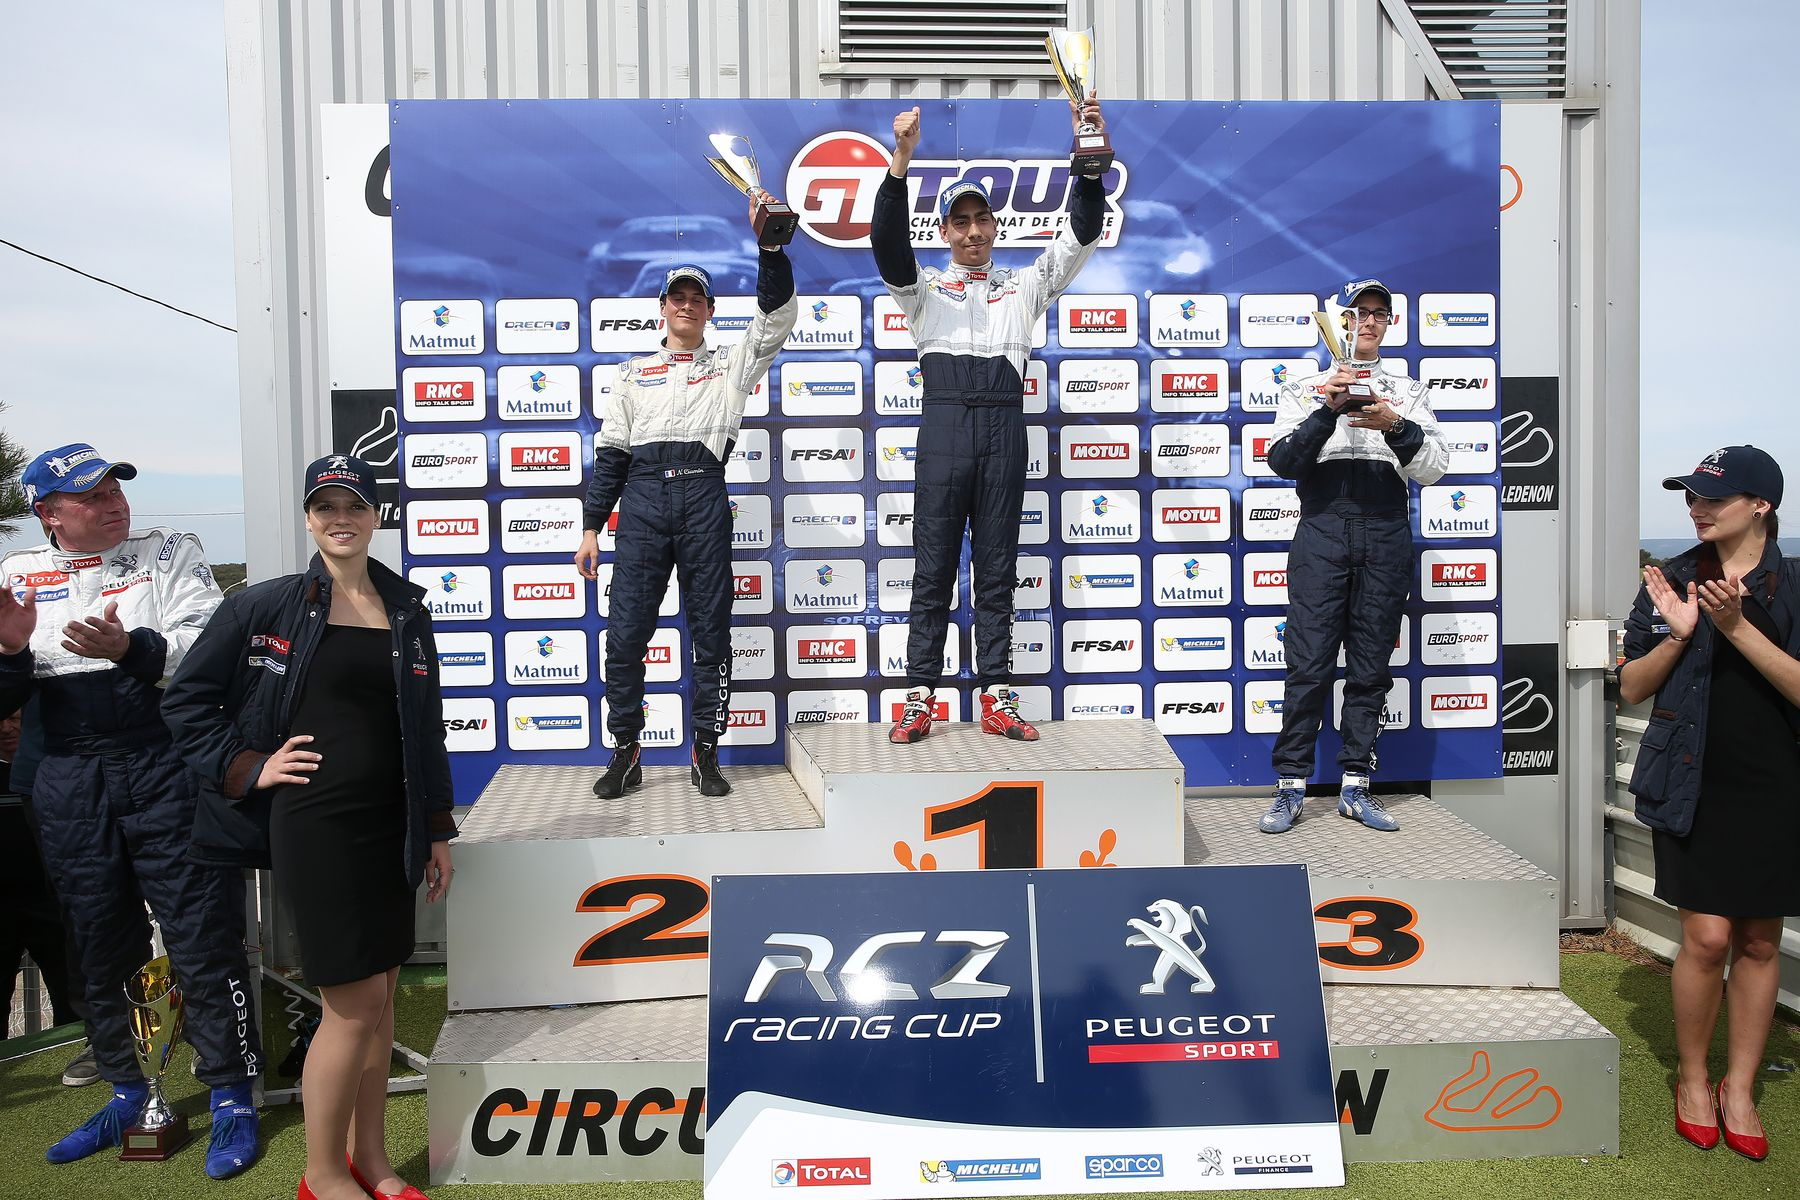 Rencontres Peugeot Sport - Nogaro 2011